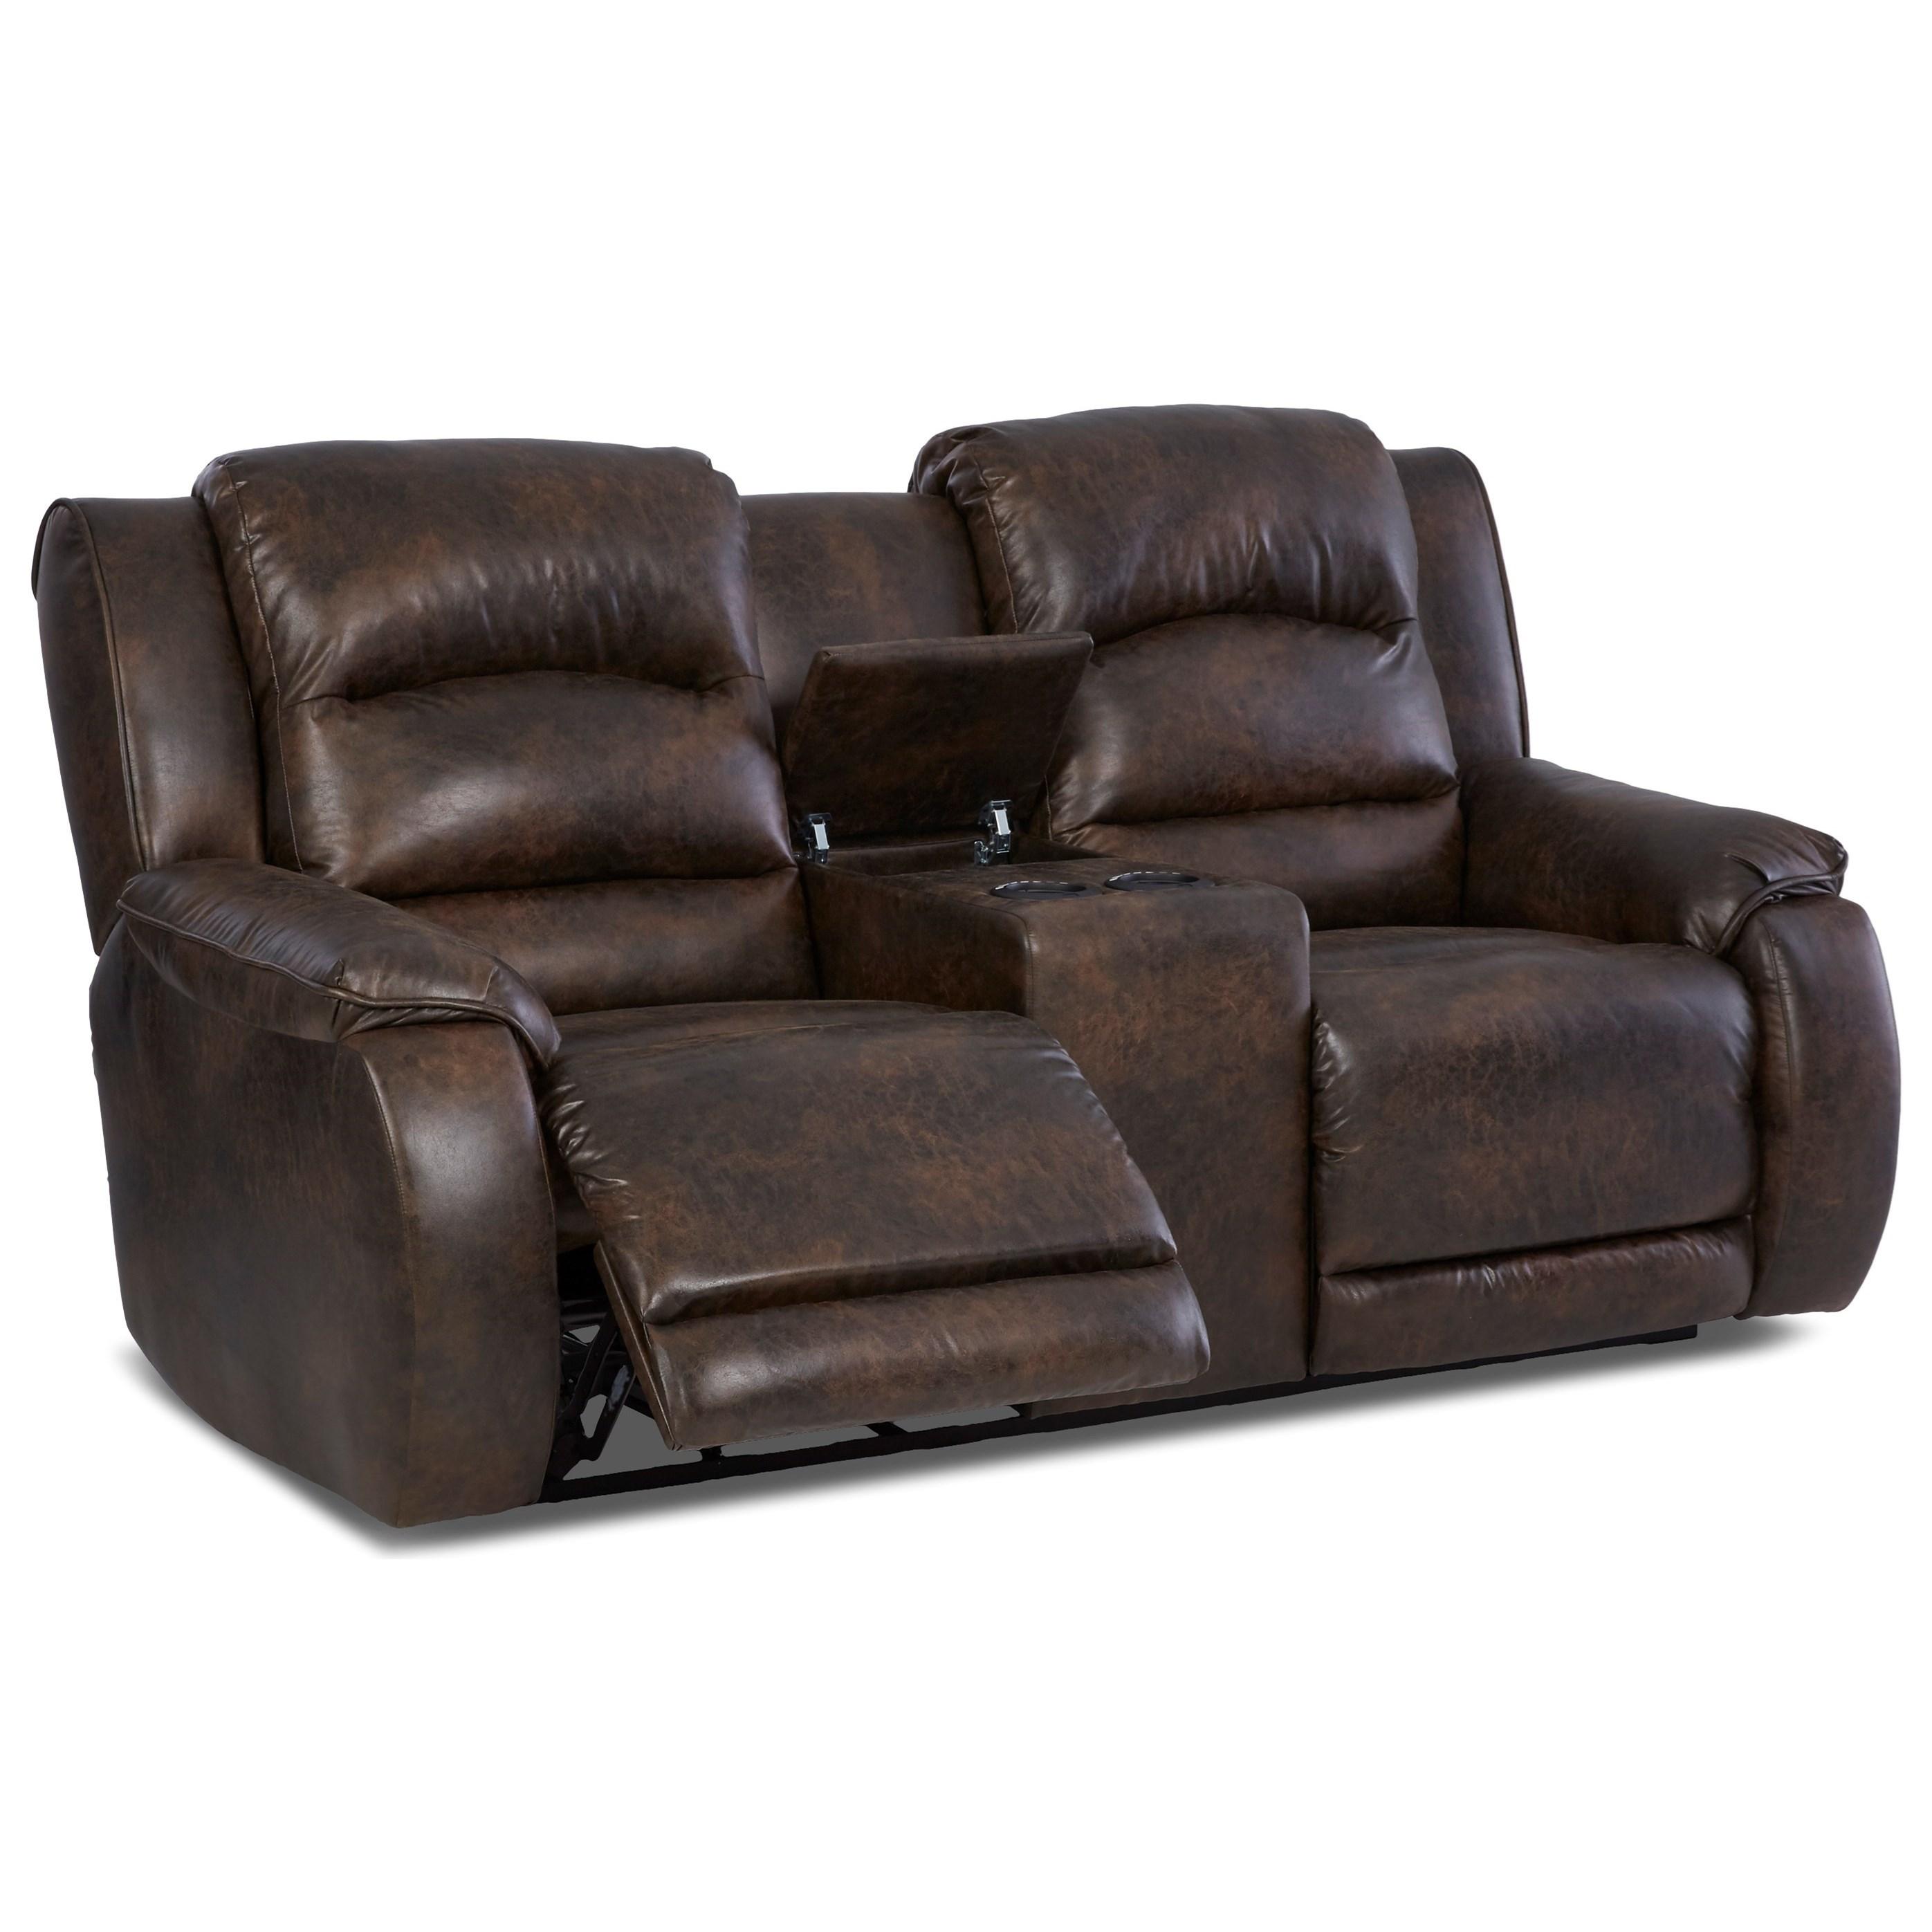 Reclining Sofa With Lumbar Support Rs Gold Sofa